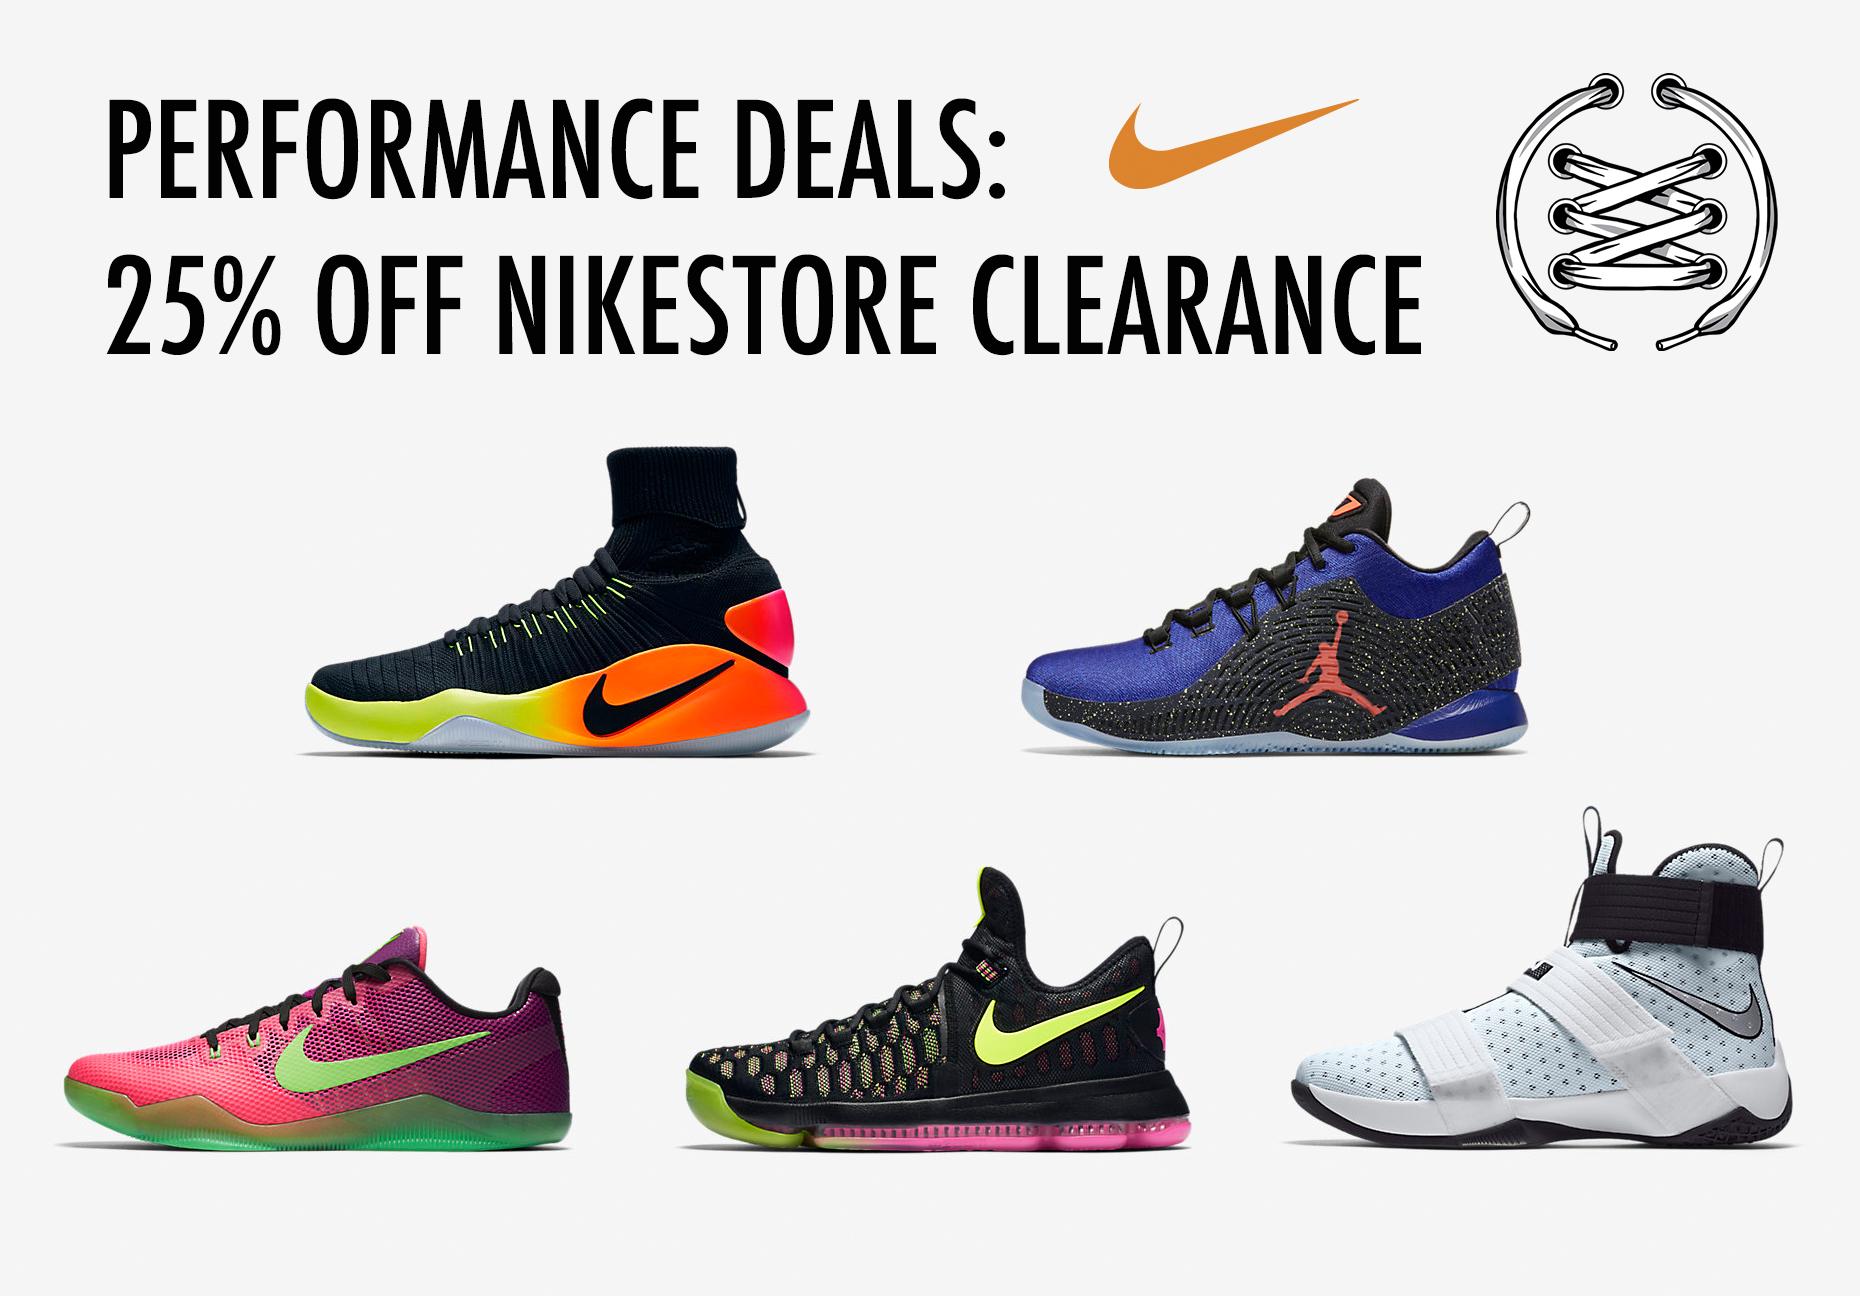 nike performance deals3